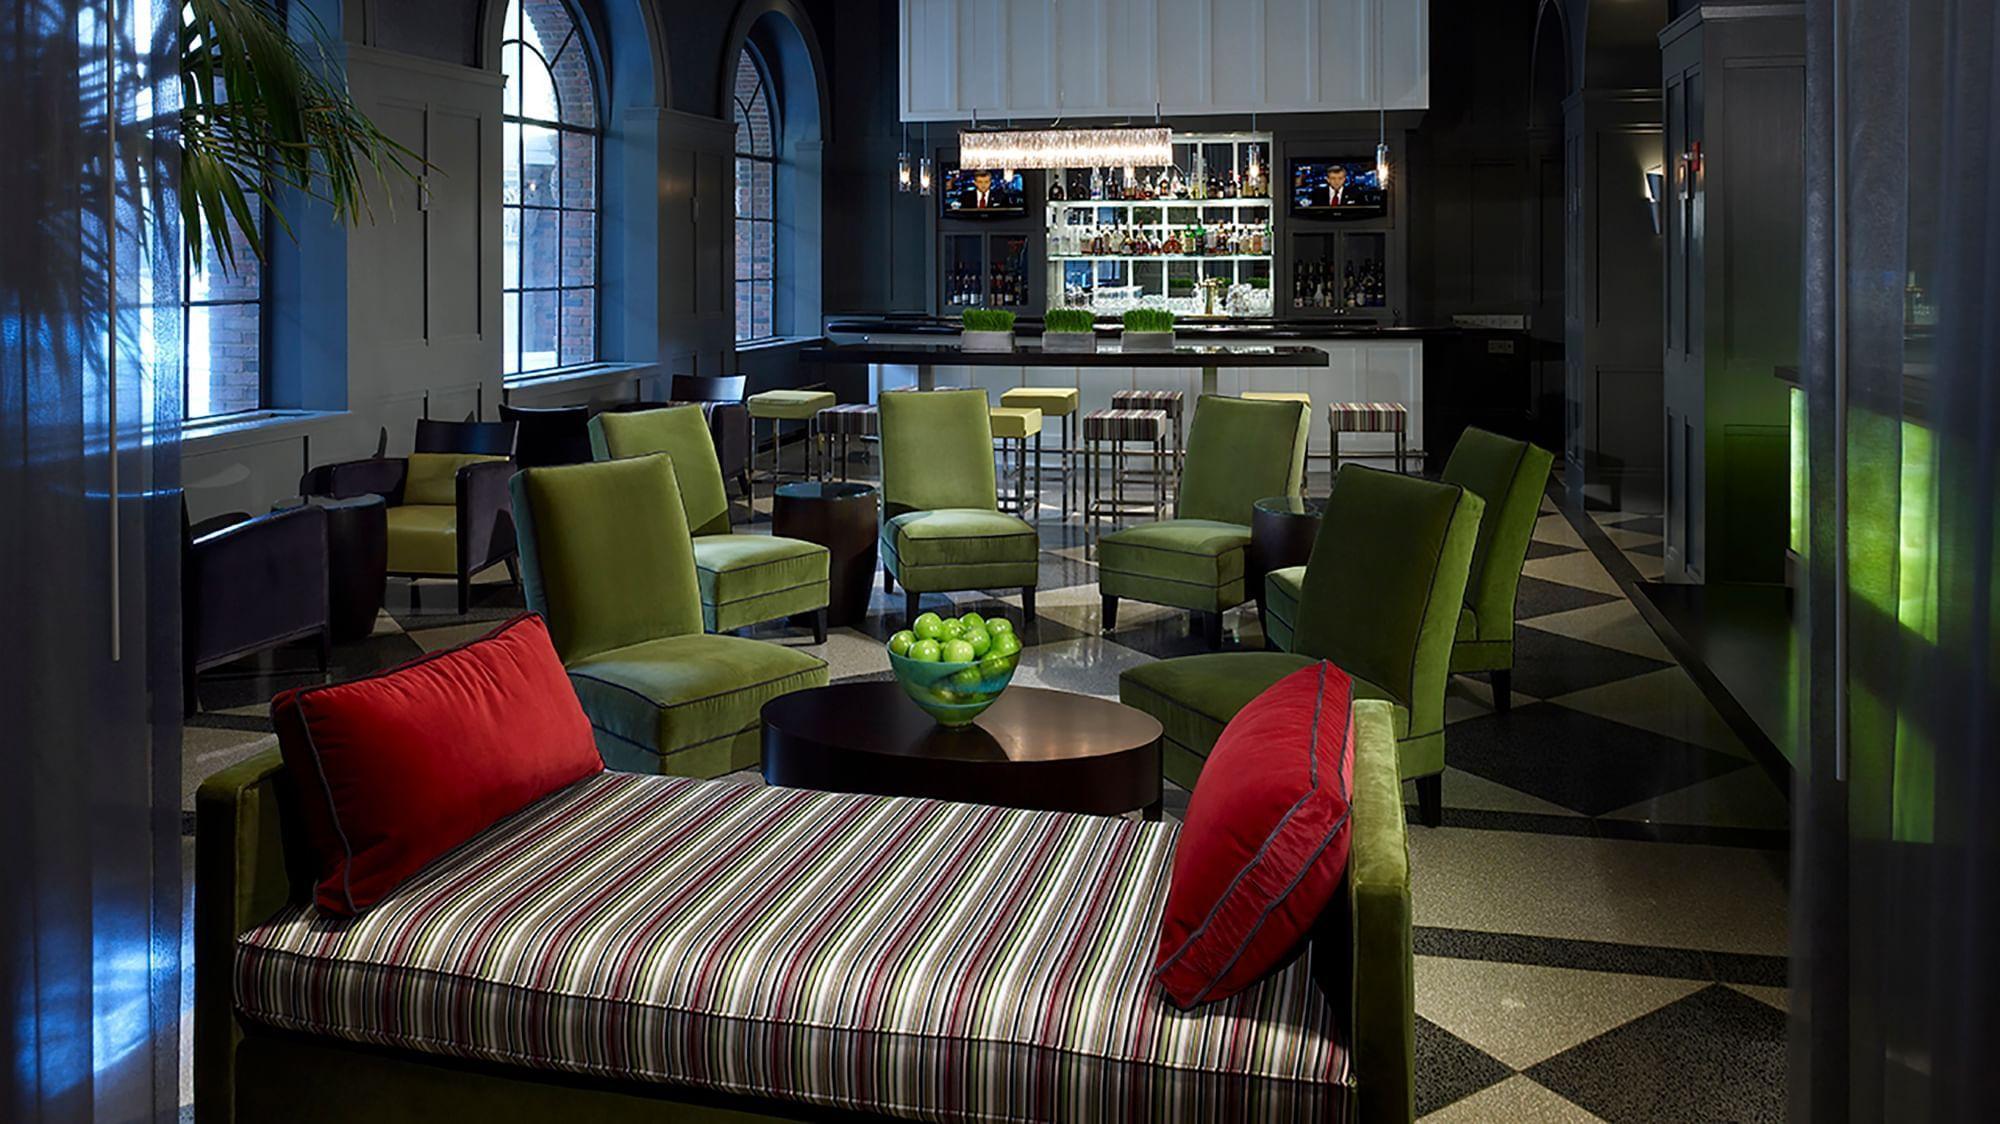 M Avenue Lounge at Warwick Allerton